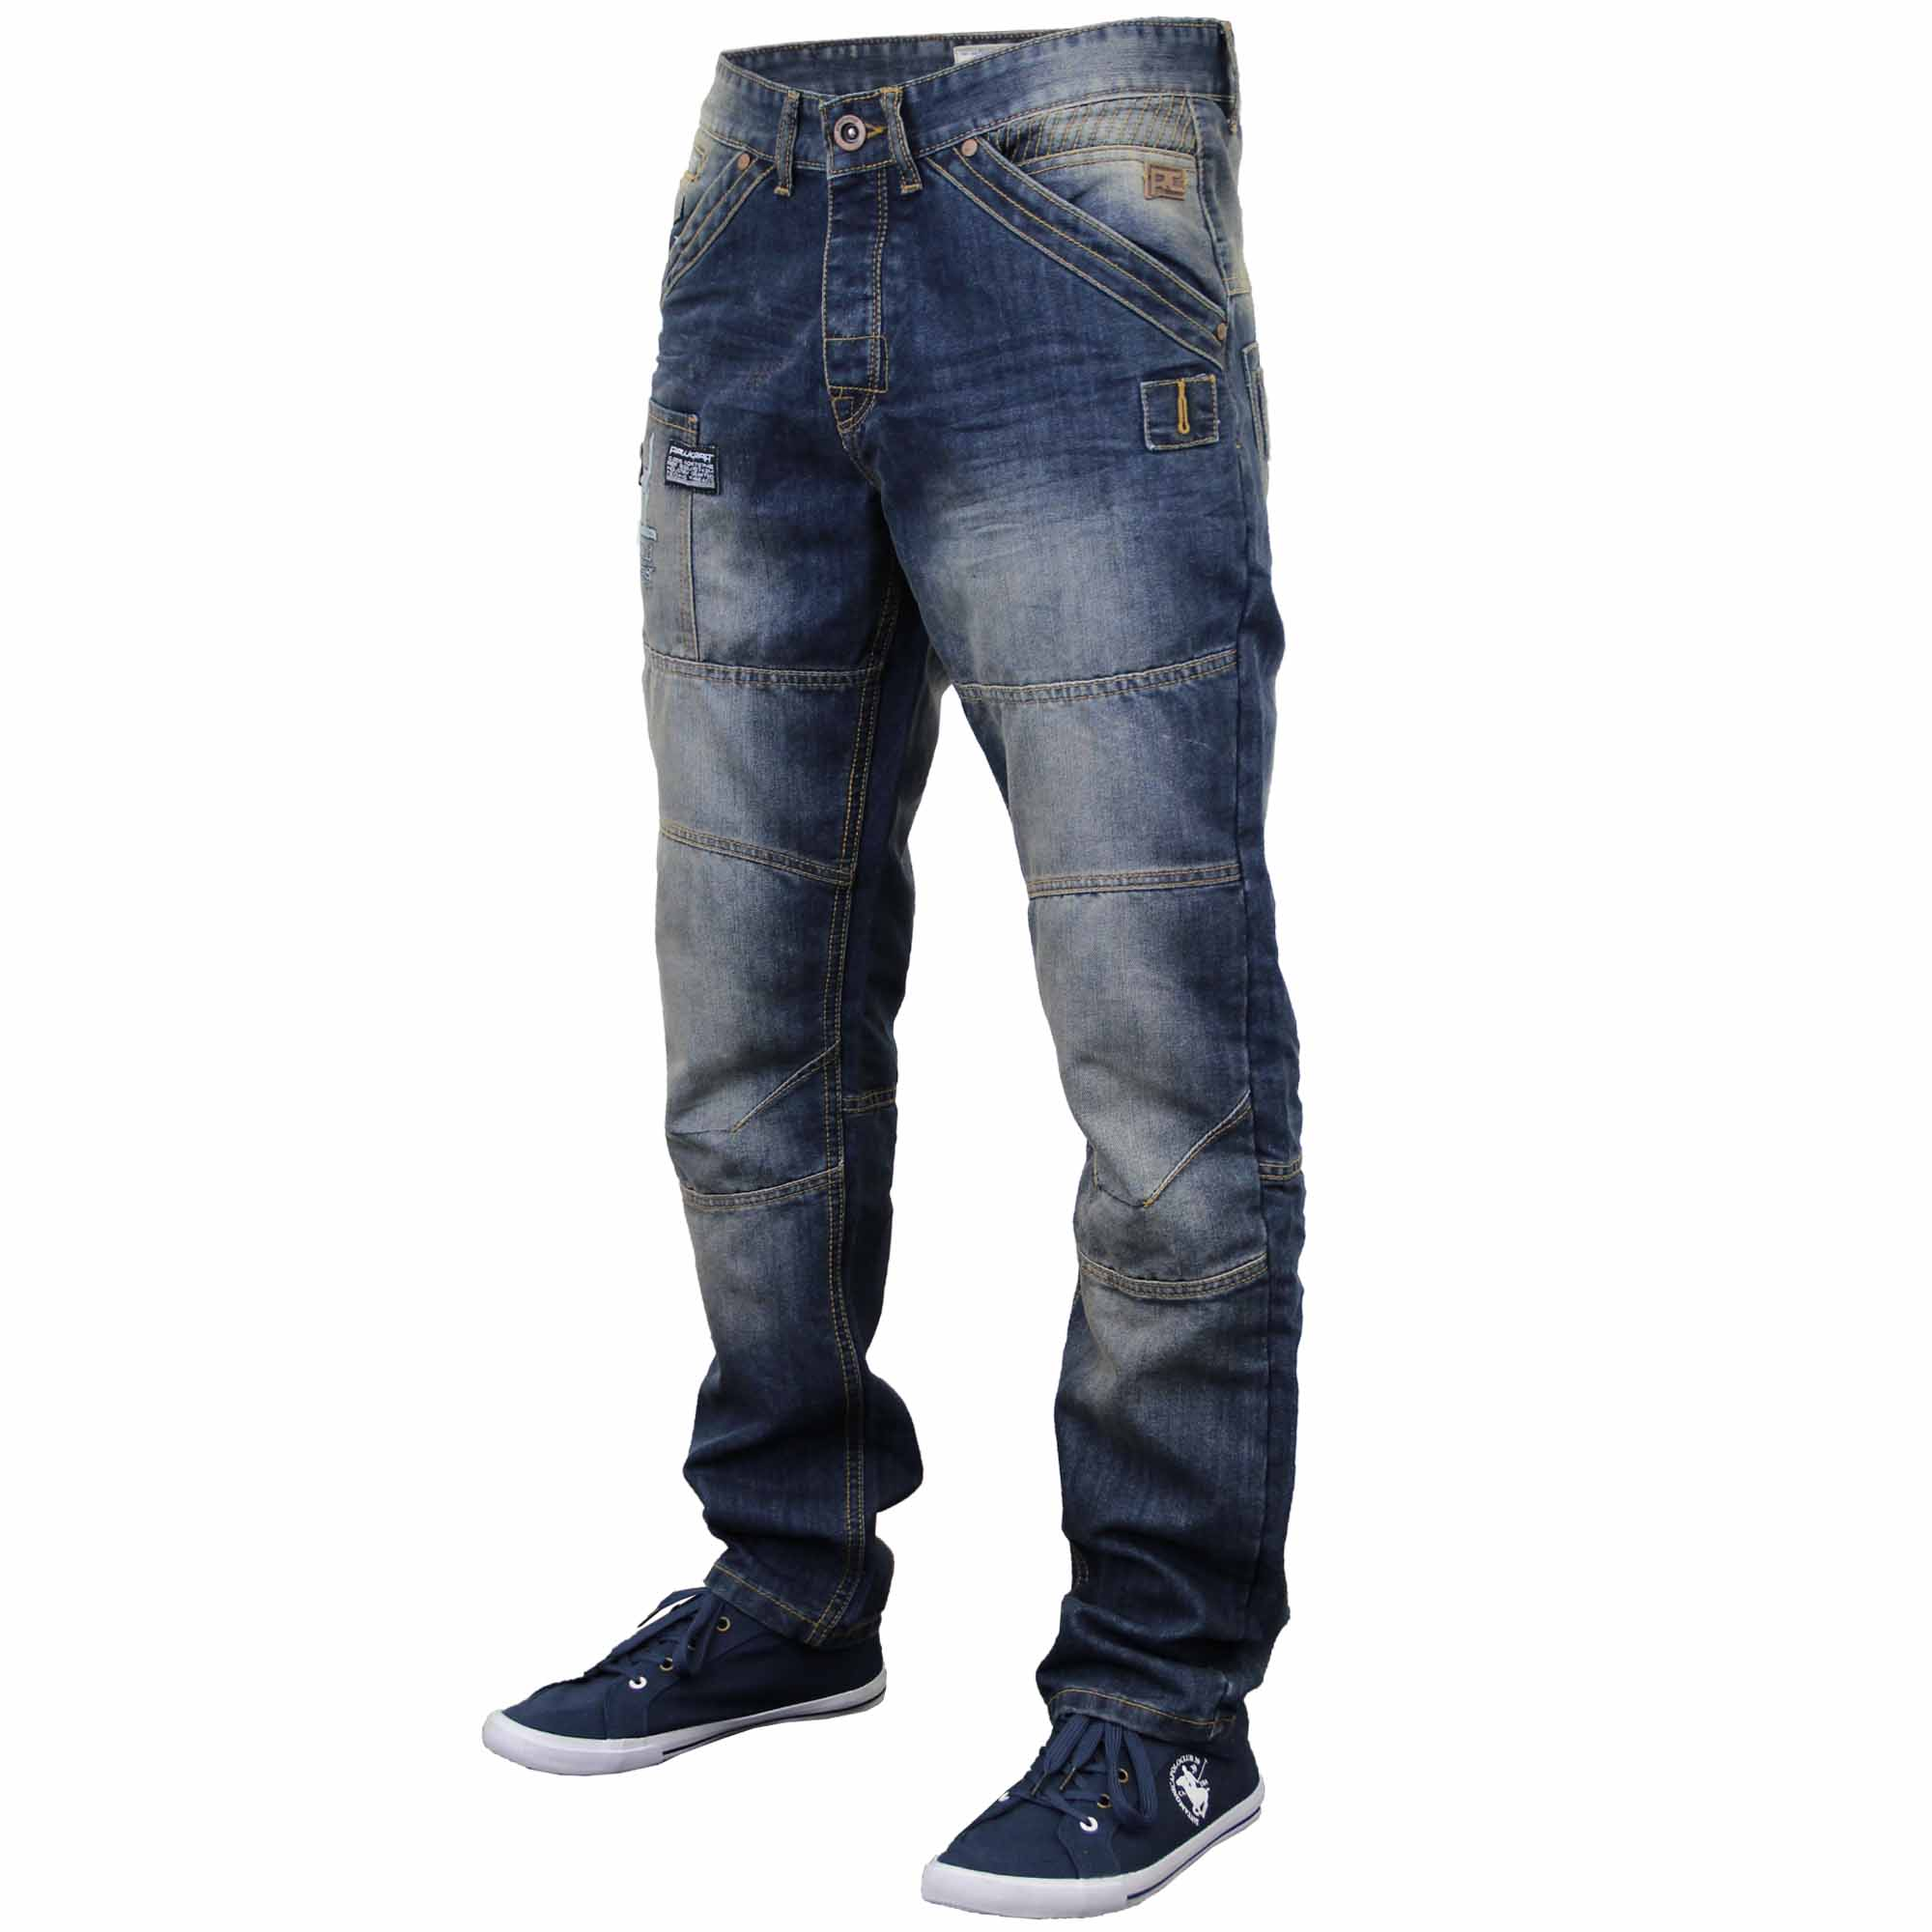 mens jeans rawcraft denim tapered straight leg bottom button zip fashion casual. Black Bedroom Furniture Sets. Home Design Ideas